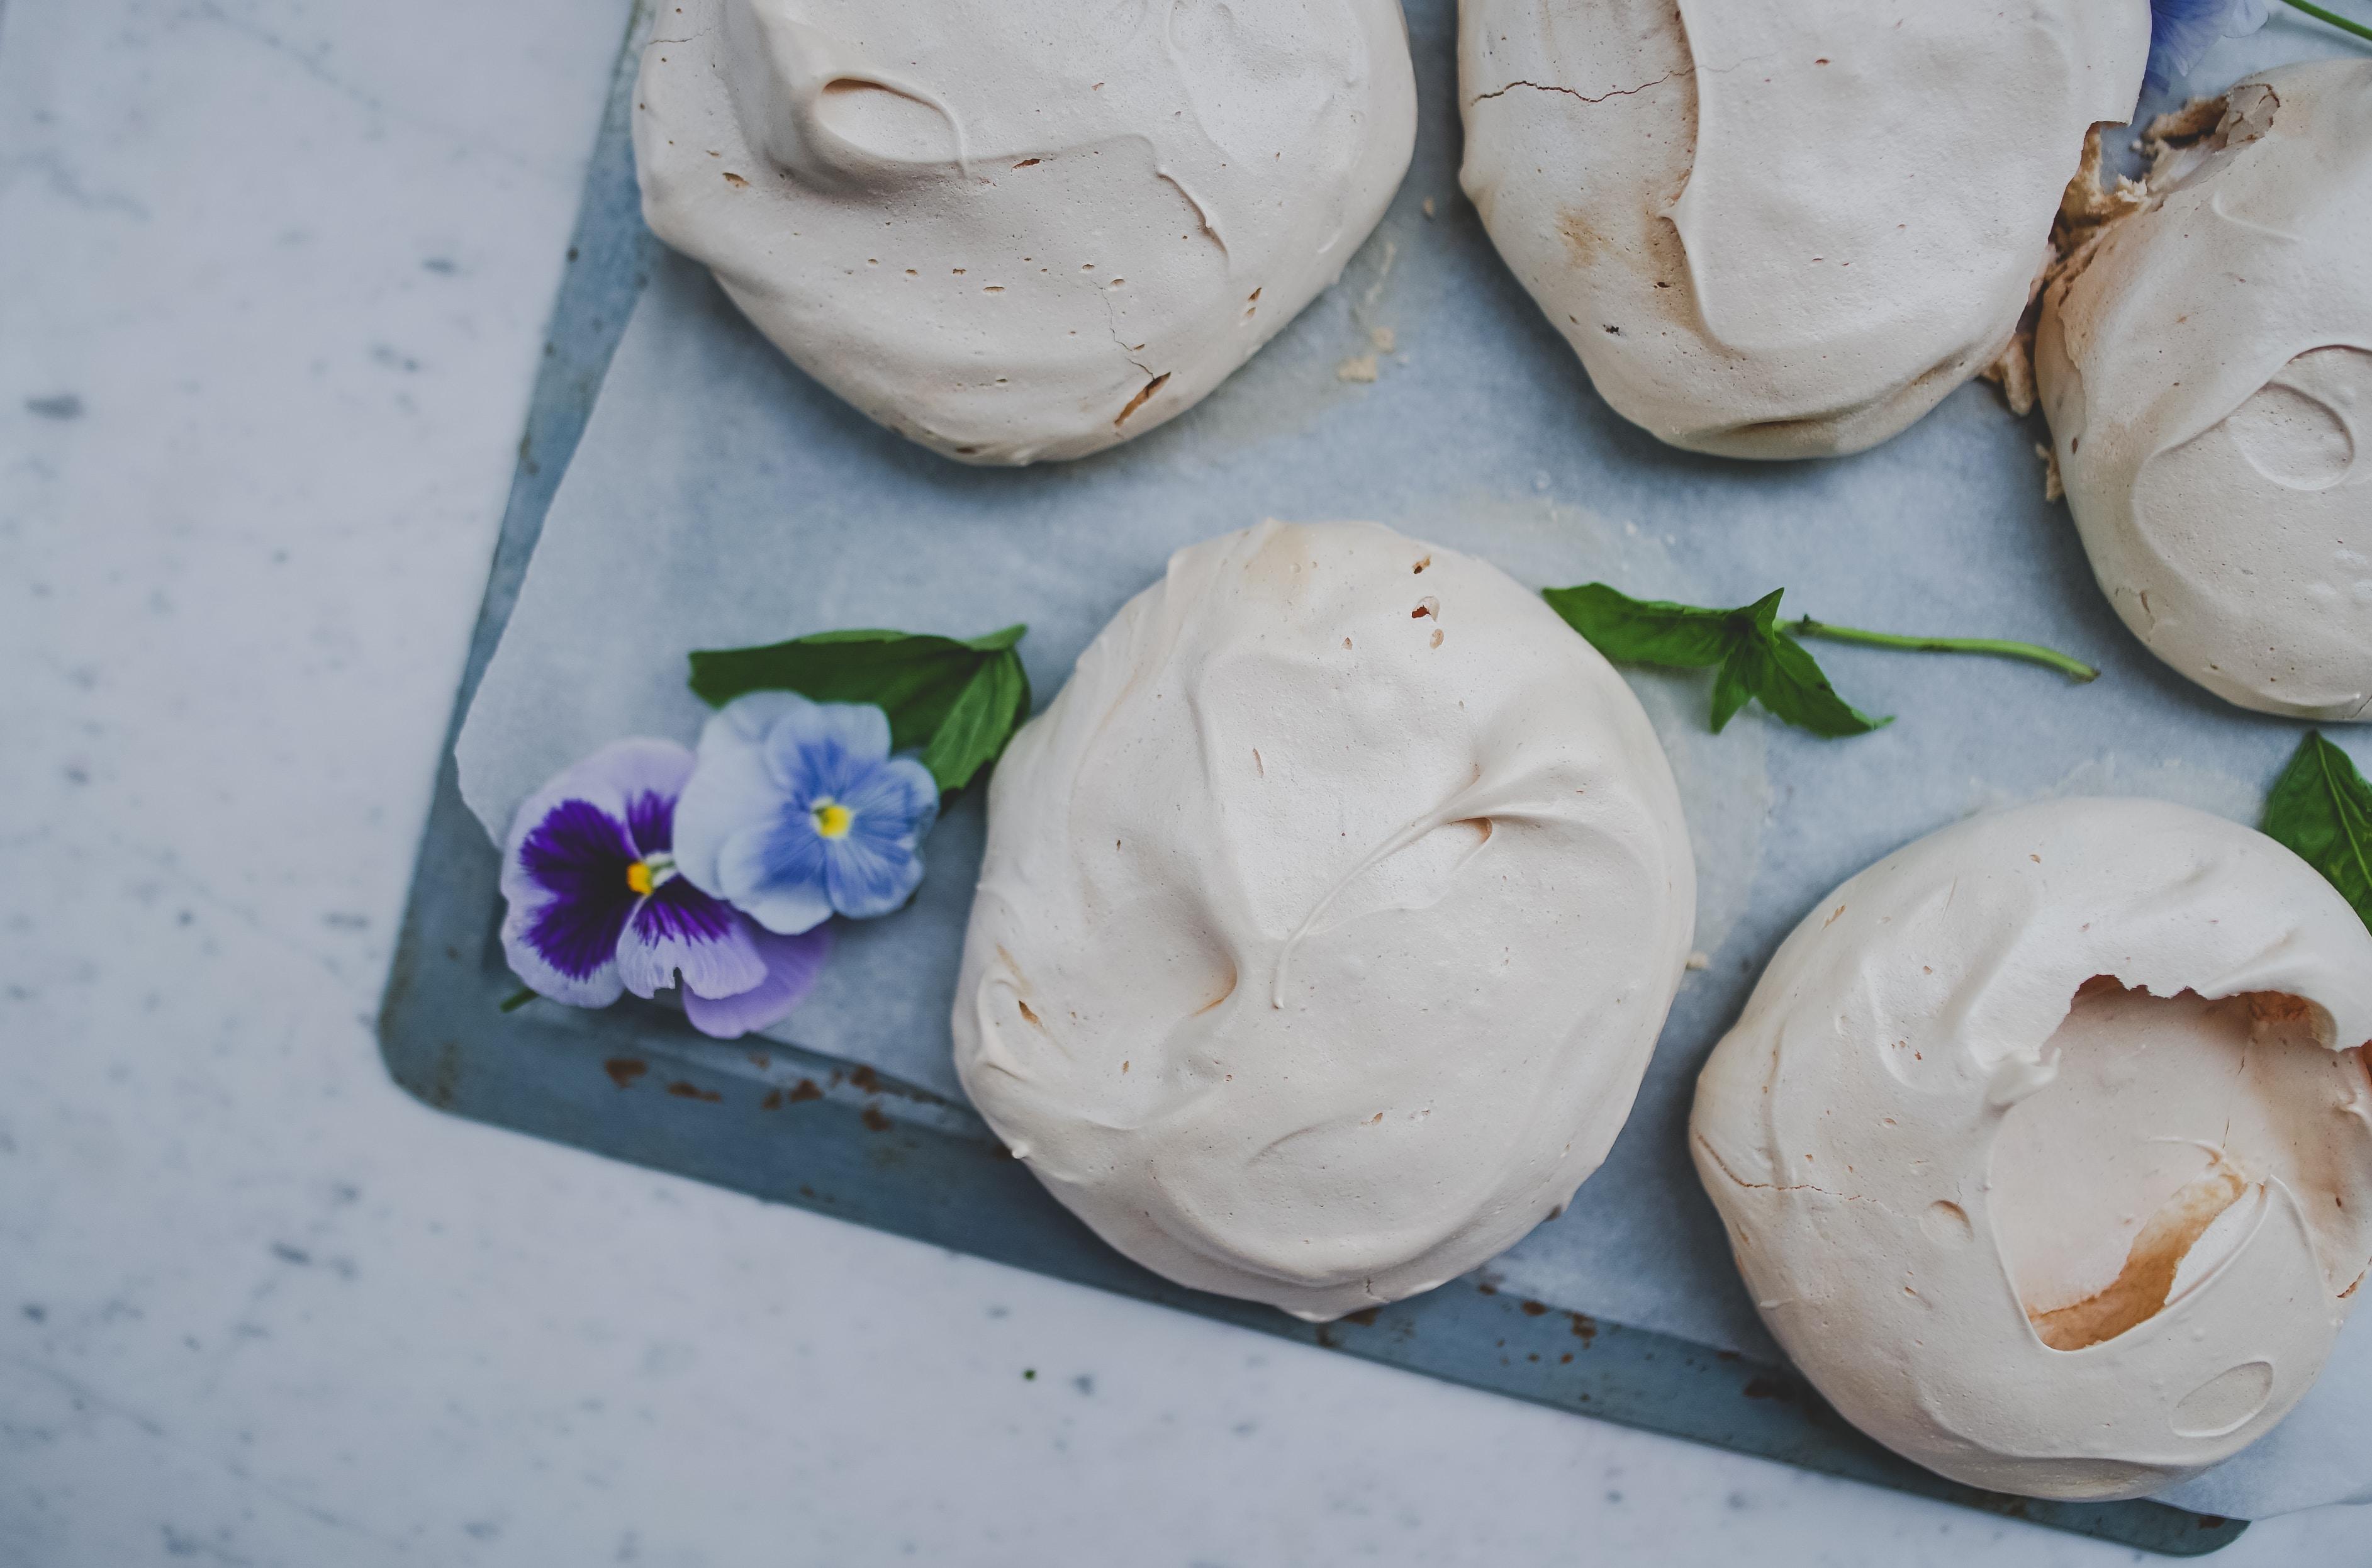 round pastries